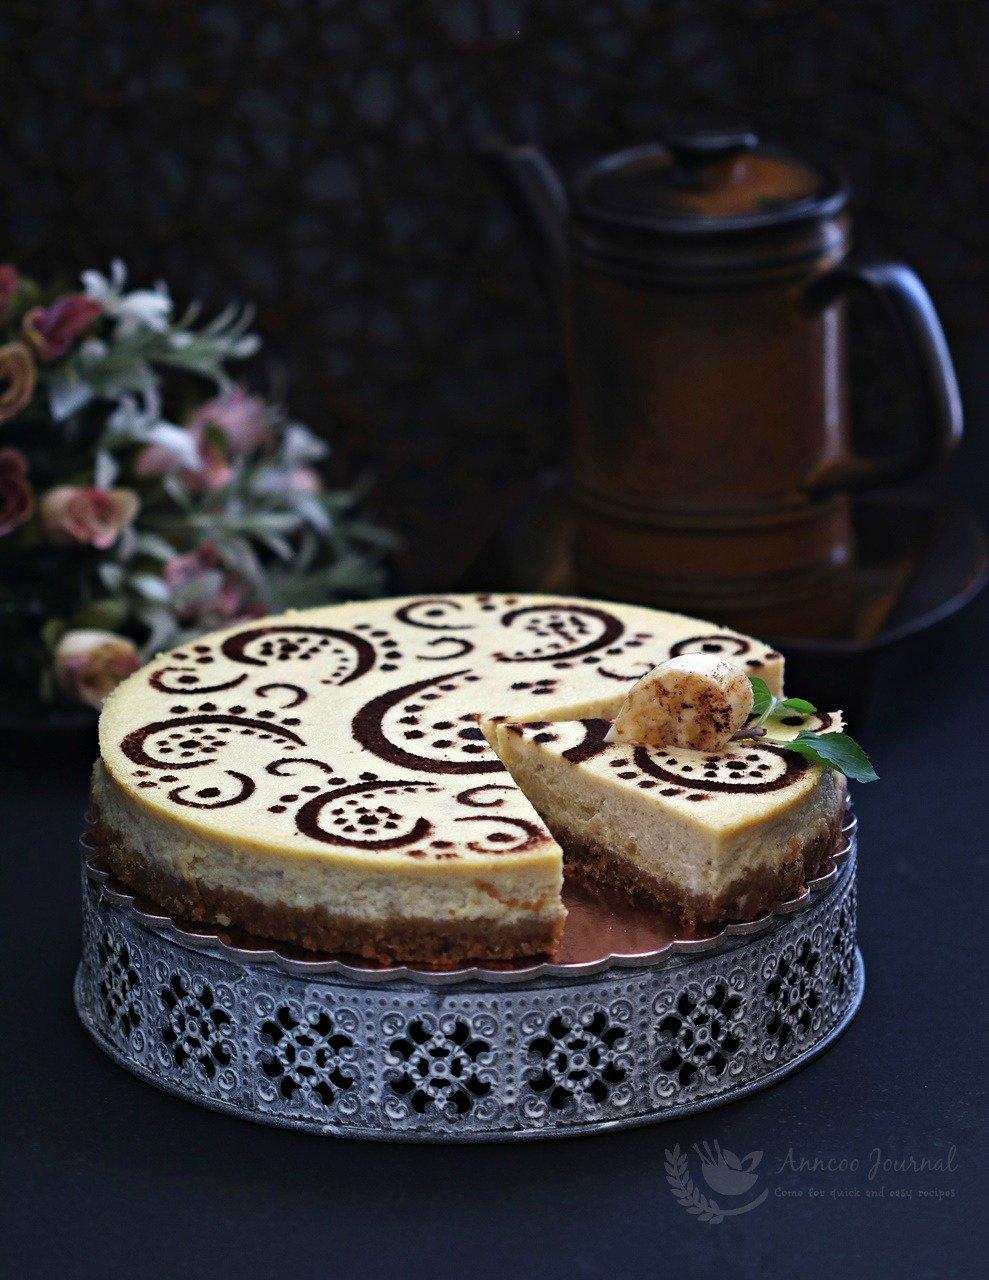 baked banana cheesecake